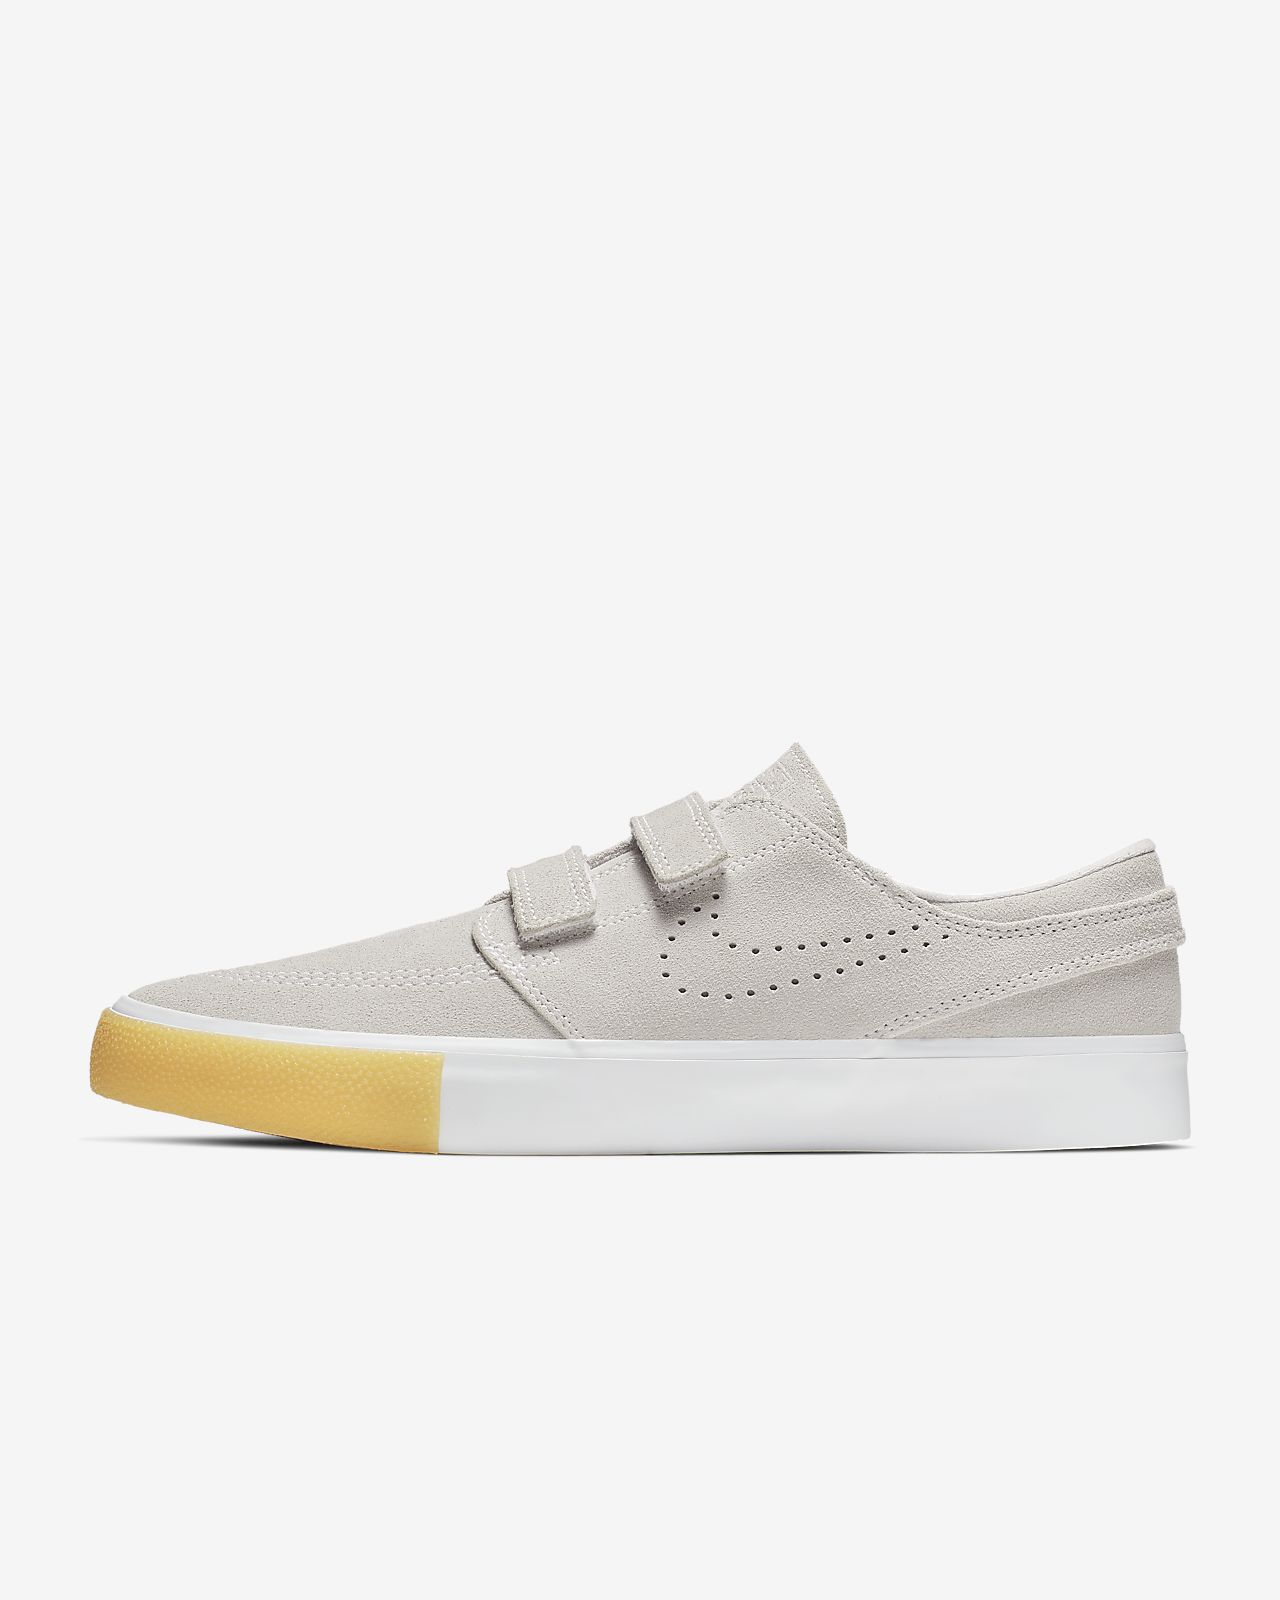 Chaussure de skateboard Nike SB Zoom Stefan Janoski AC RM SE